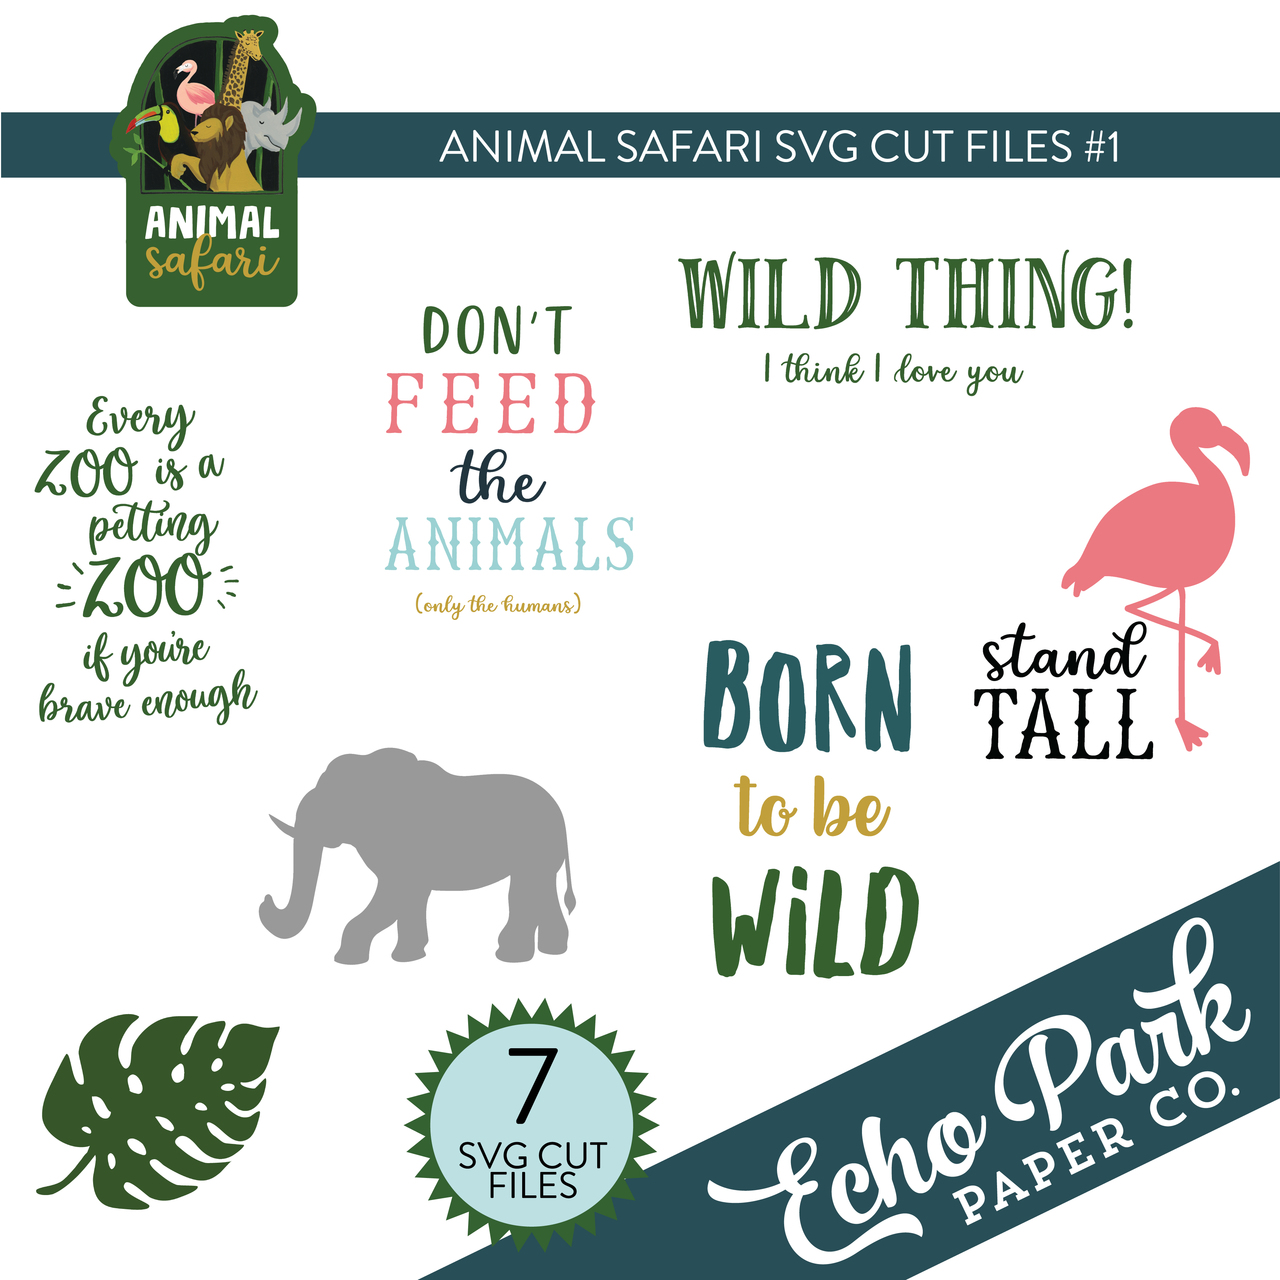 Animal Safari SVG Cut Files #1